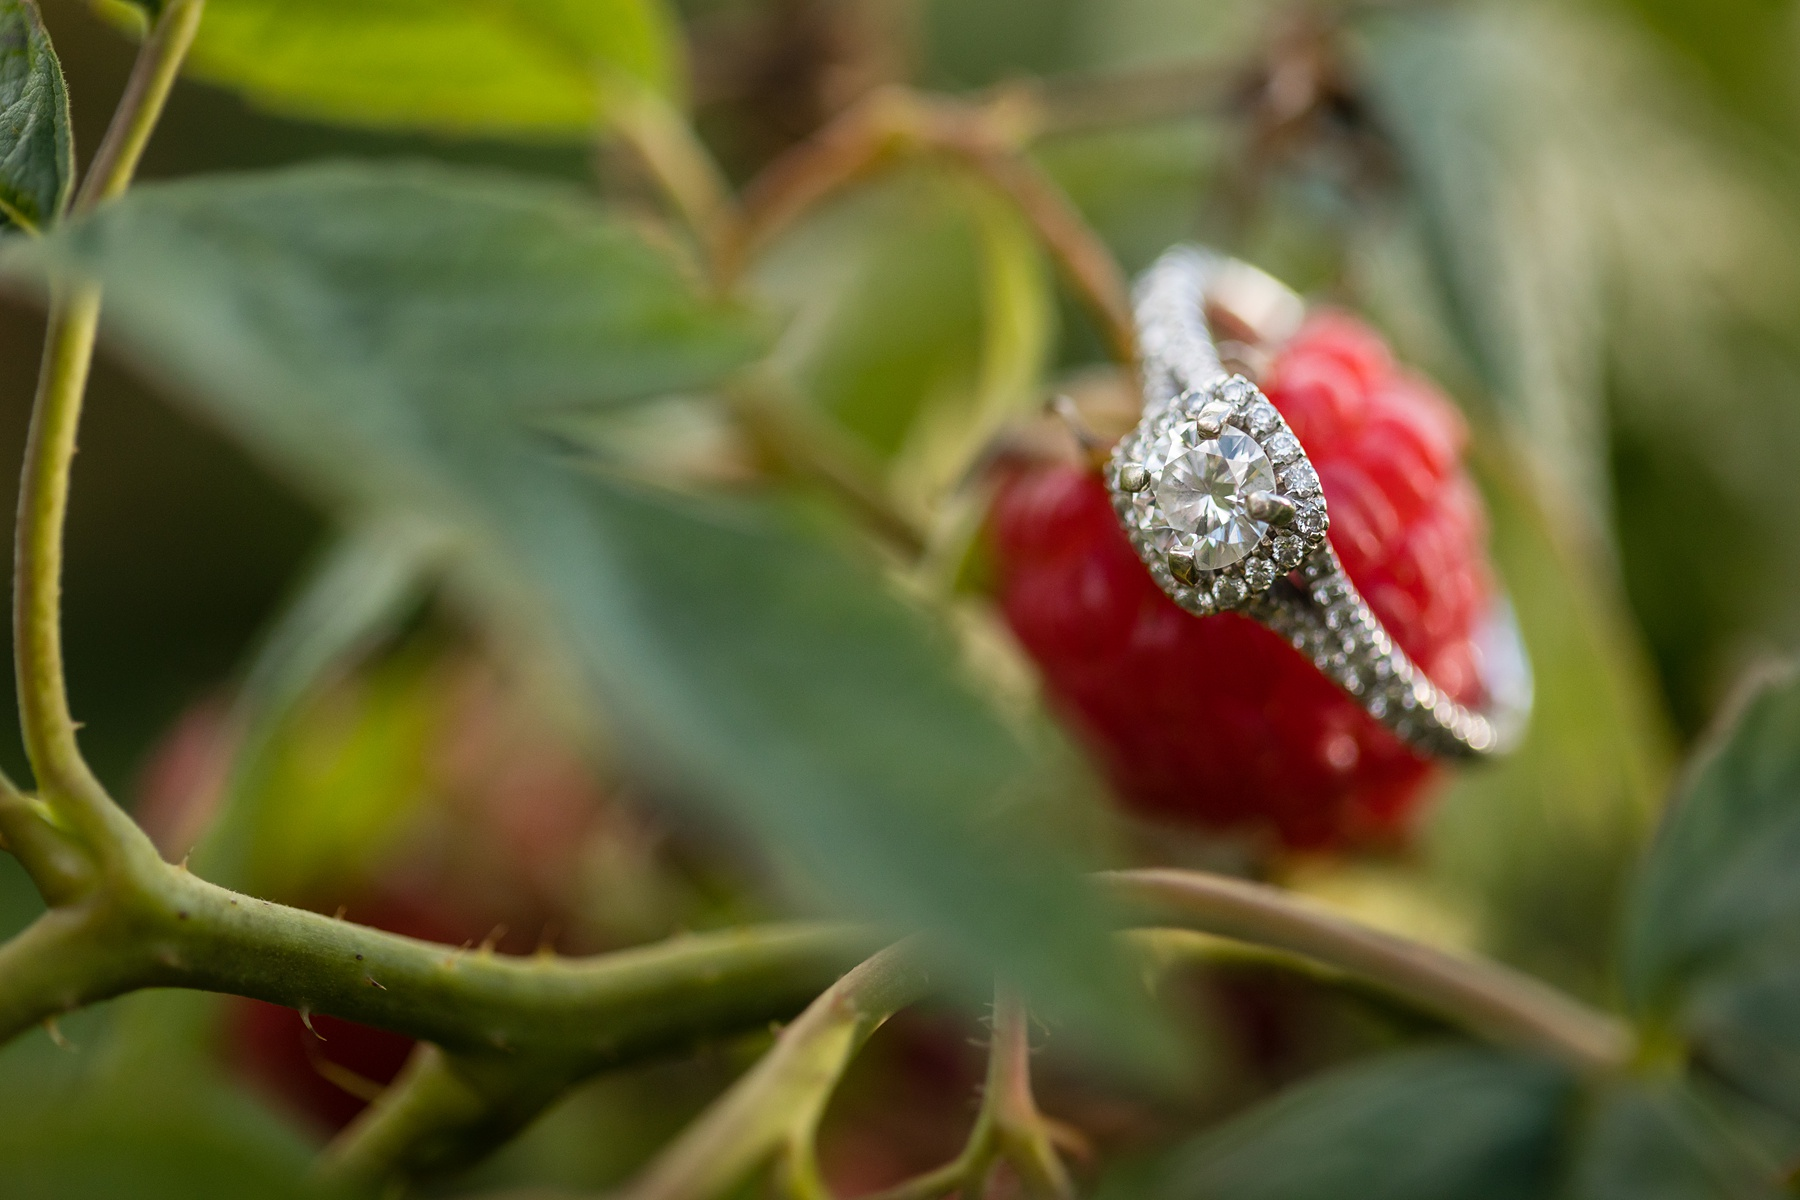 Brandon_Shafer_Photography_Danielle_Matt_Apple_Orchard_Engagement_Photos_0013.jpg